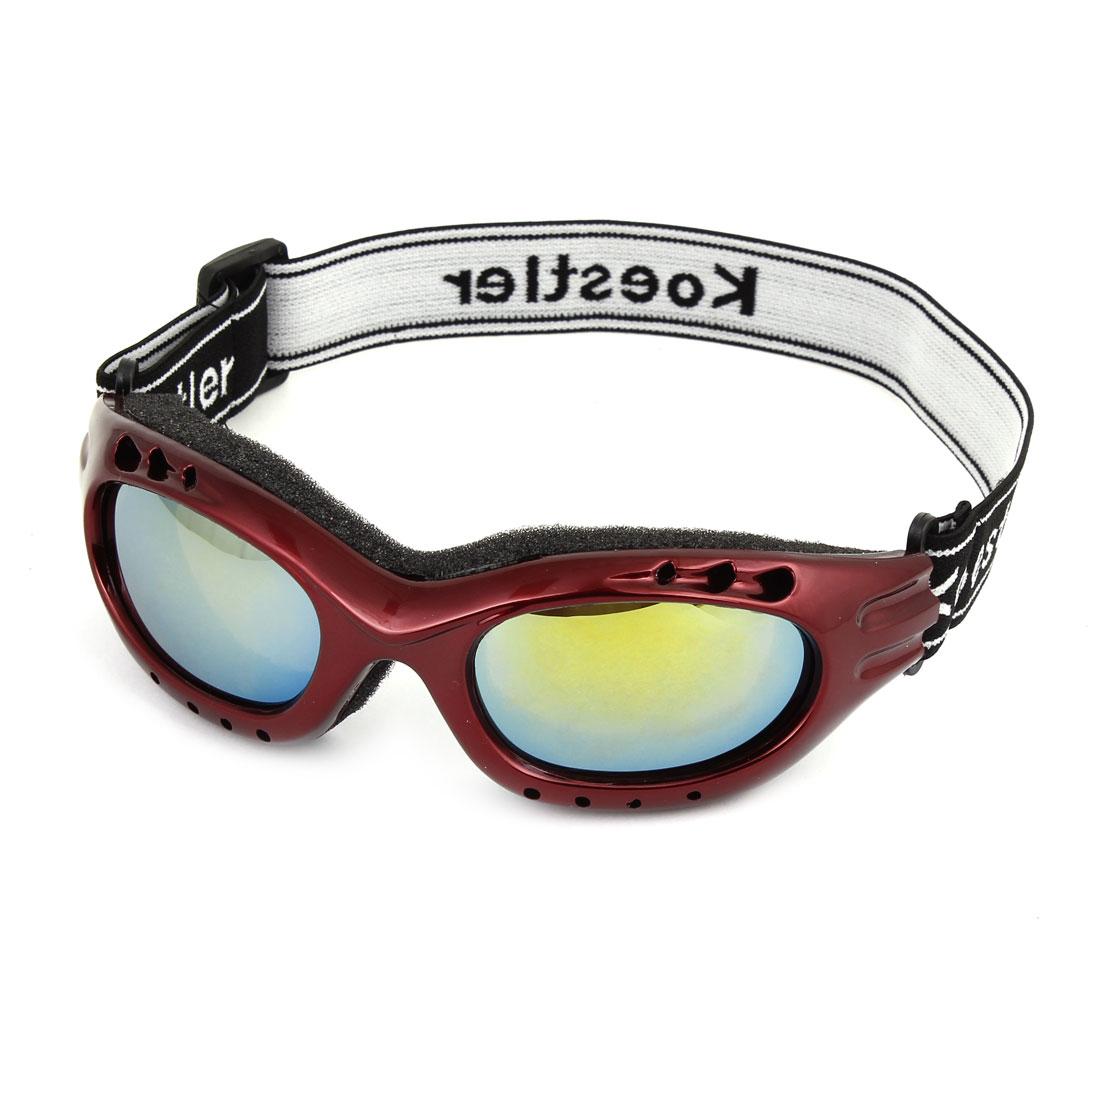 Unisex Black Adjustable Strap Windproof Eye Protective Motorcycle Skiing Goggles Burgundy